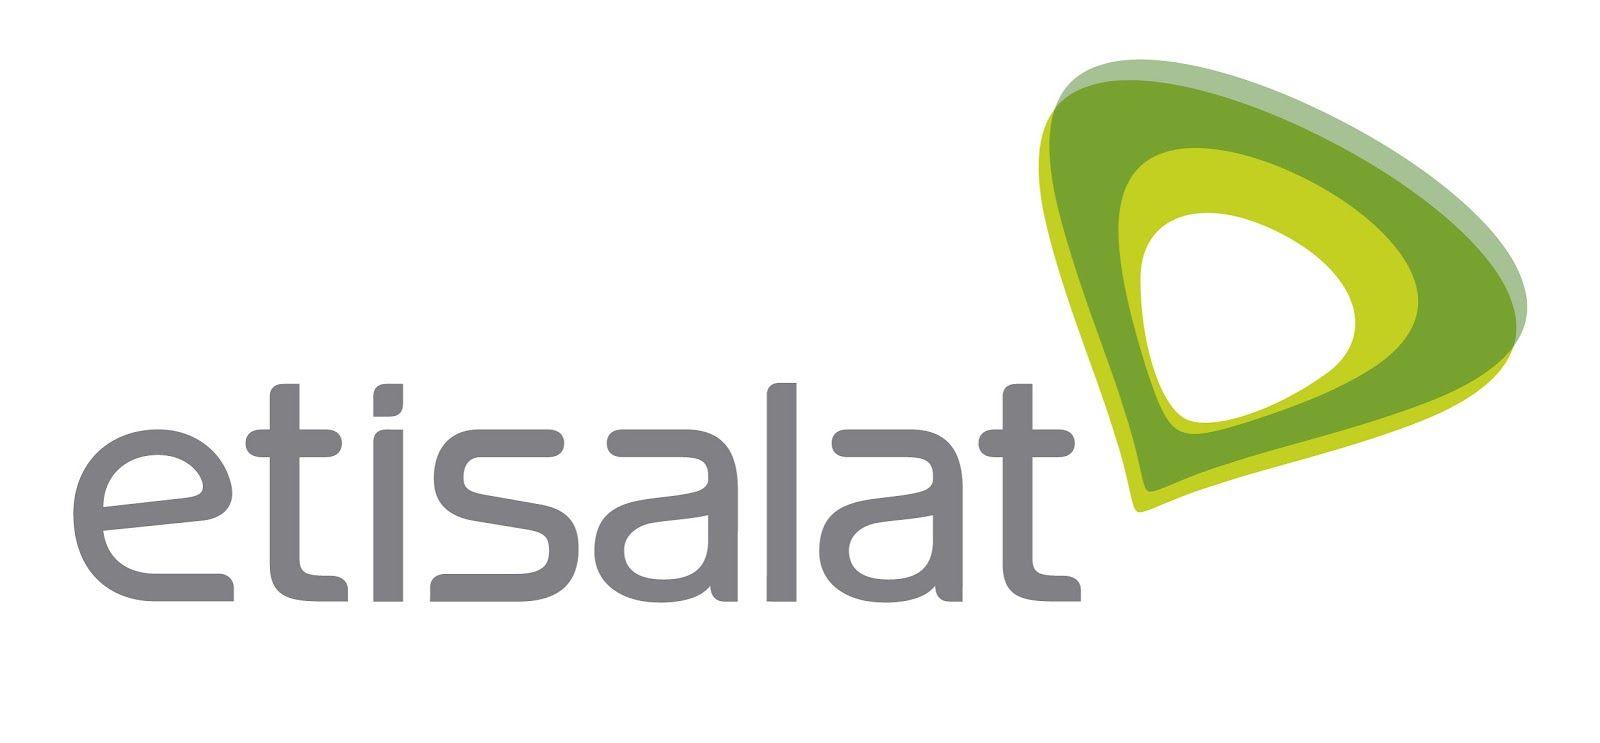 Careers in Etisalat, Telecom Jobs in AUE, Etisalat Manager